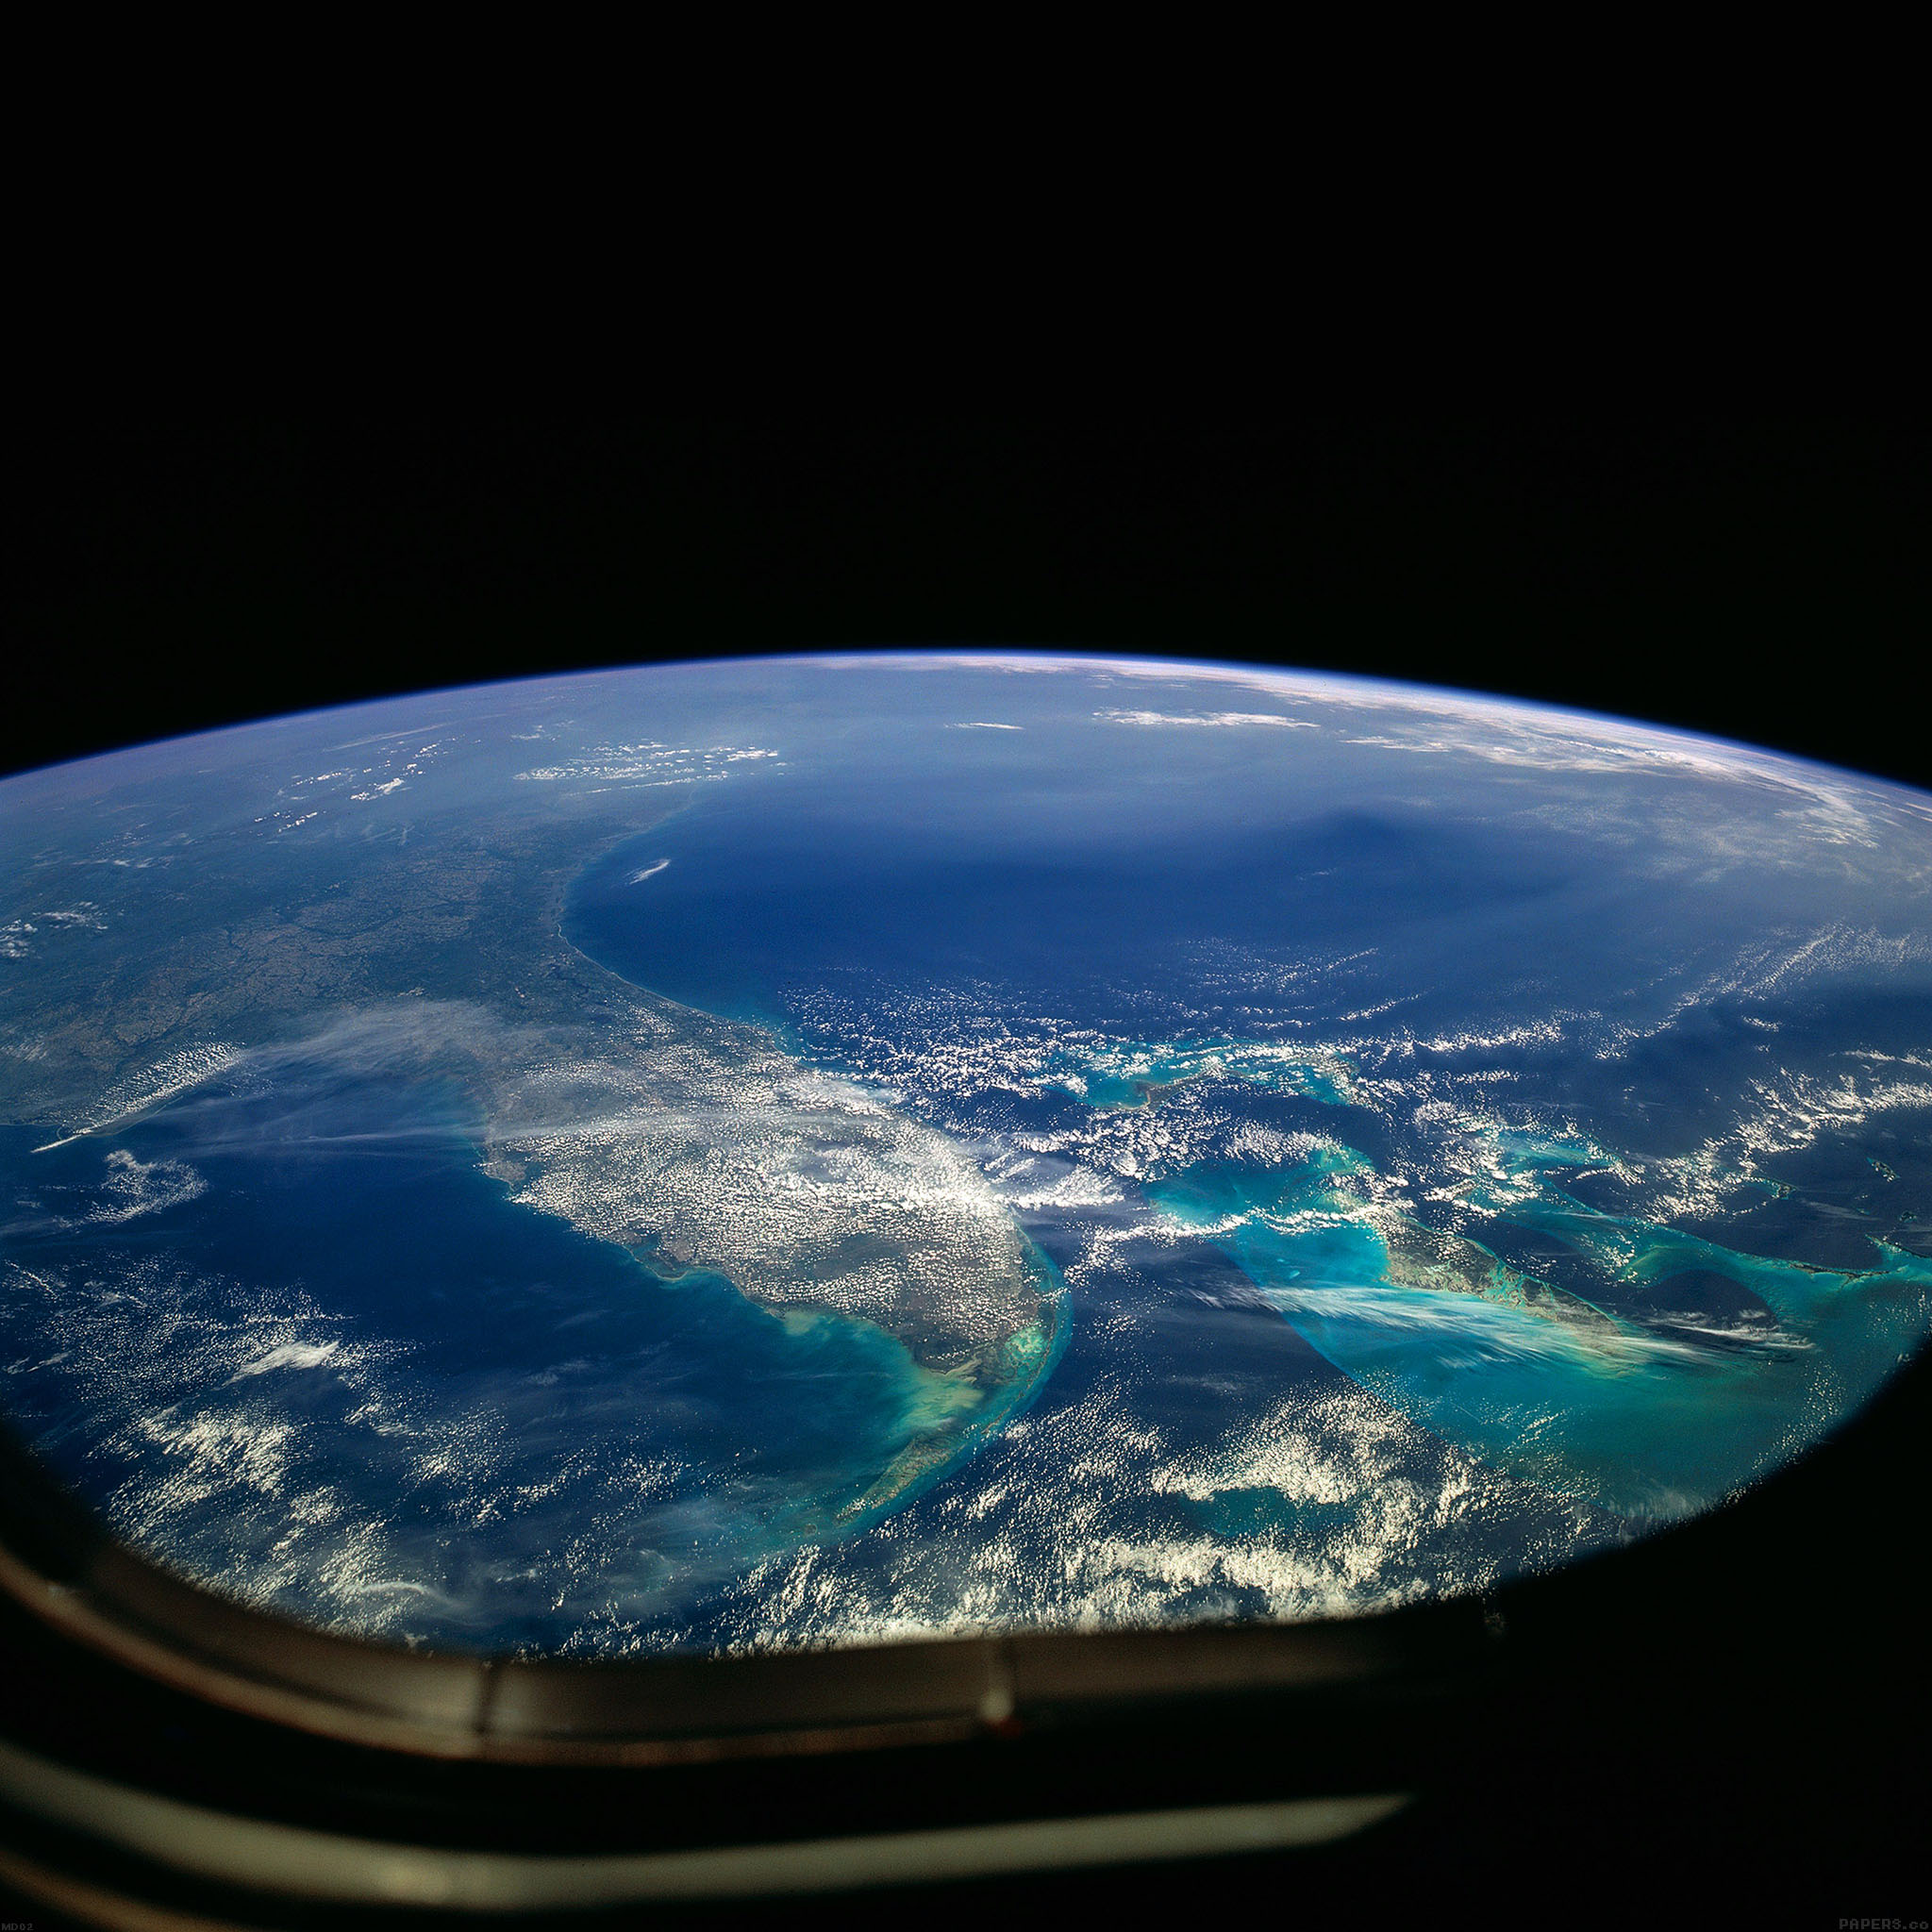 Google Earth Wallpaper: Md02-wallpaper-alien-view-of-earth-space